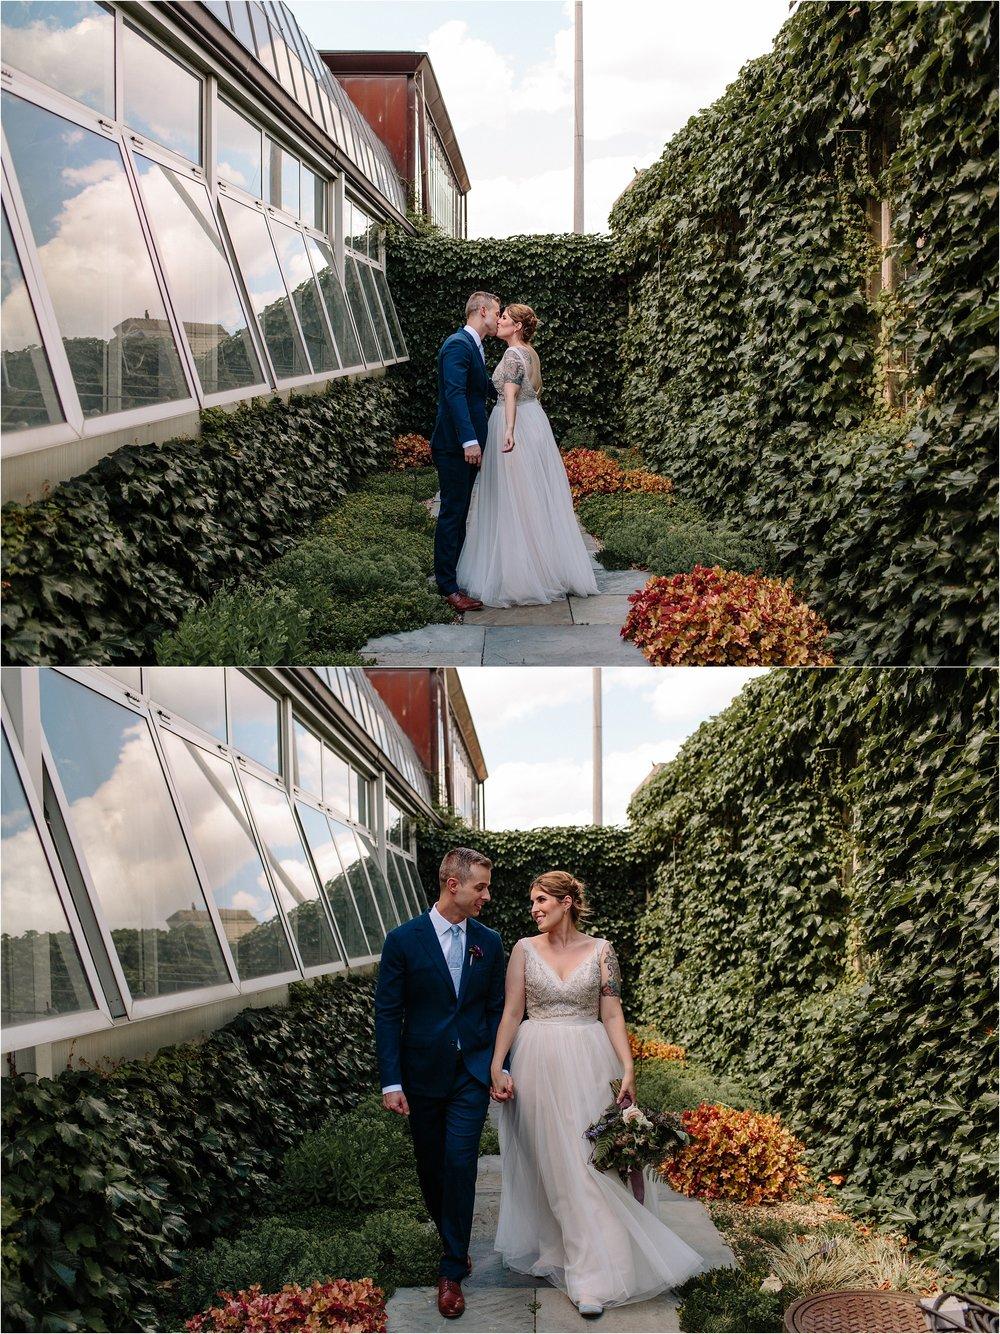 garfield-park-conservatory-wedding-156.jpg